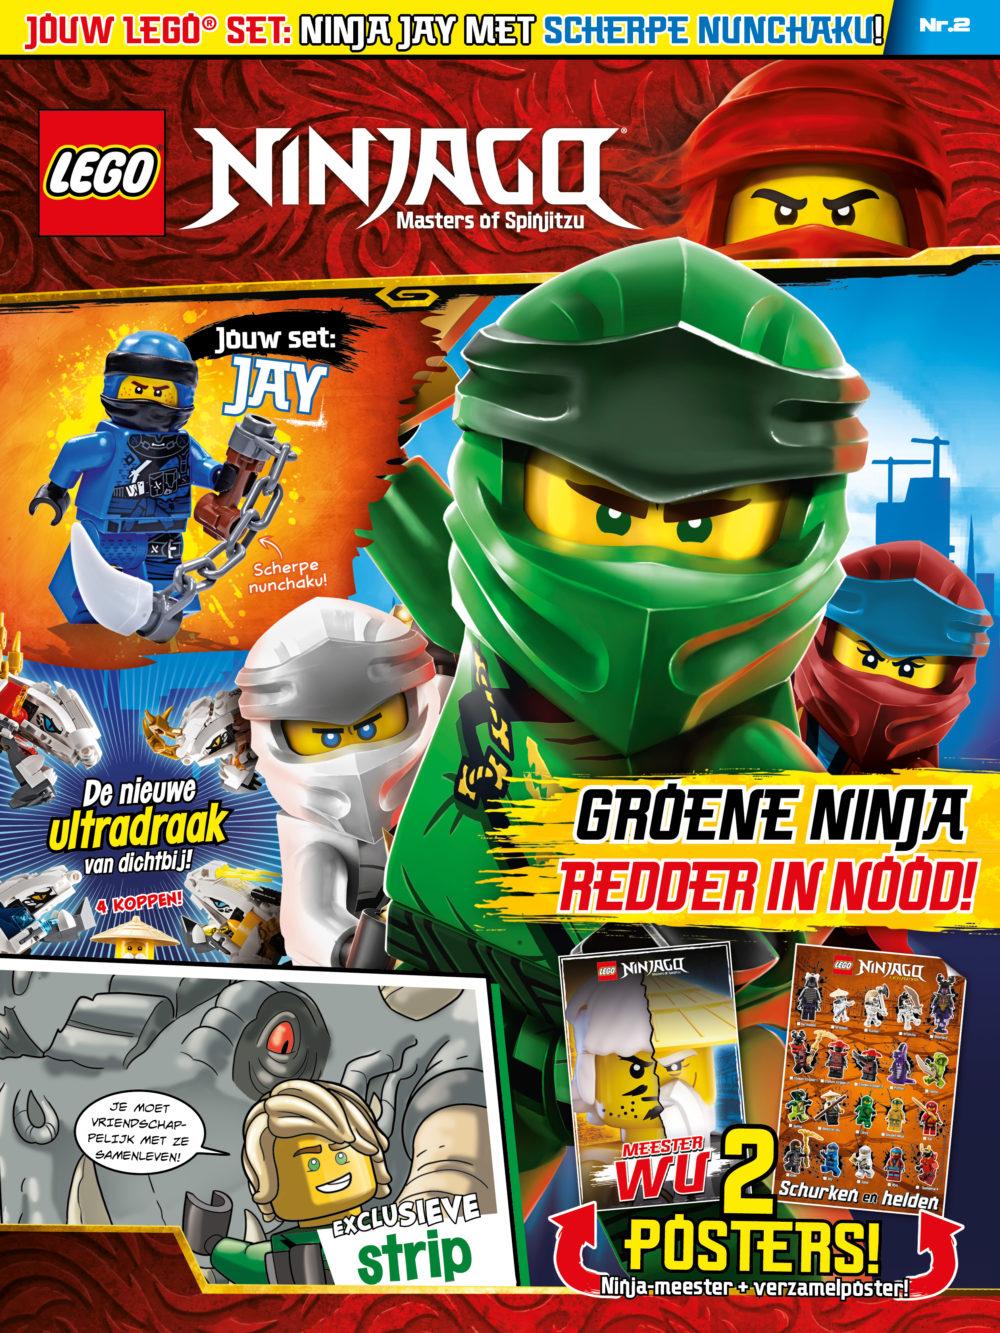 LEGO Ninjago Magazine 2 2019